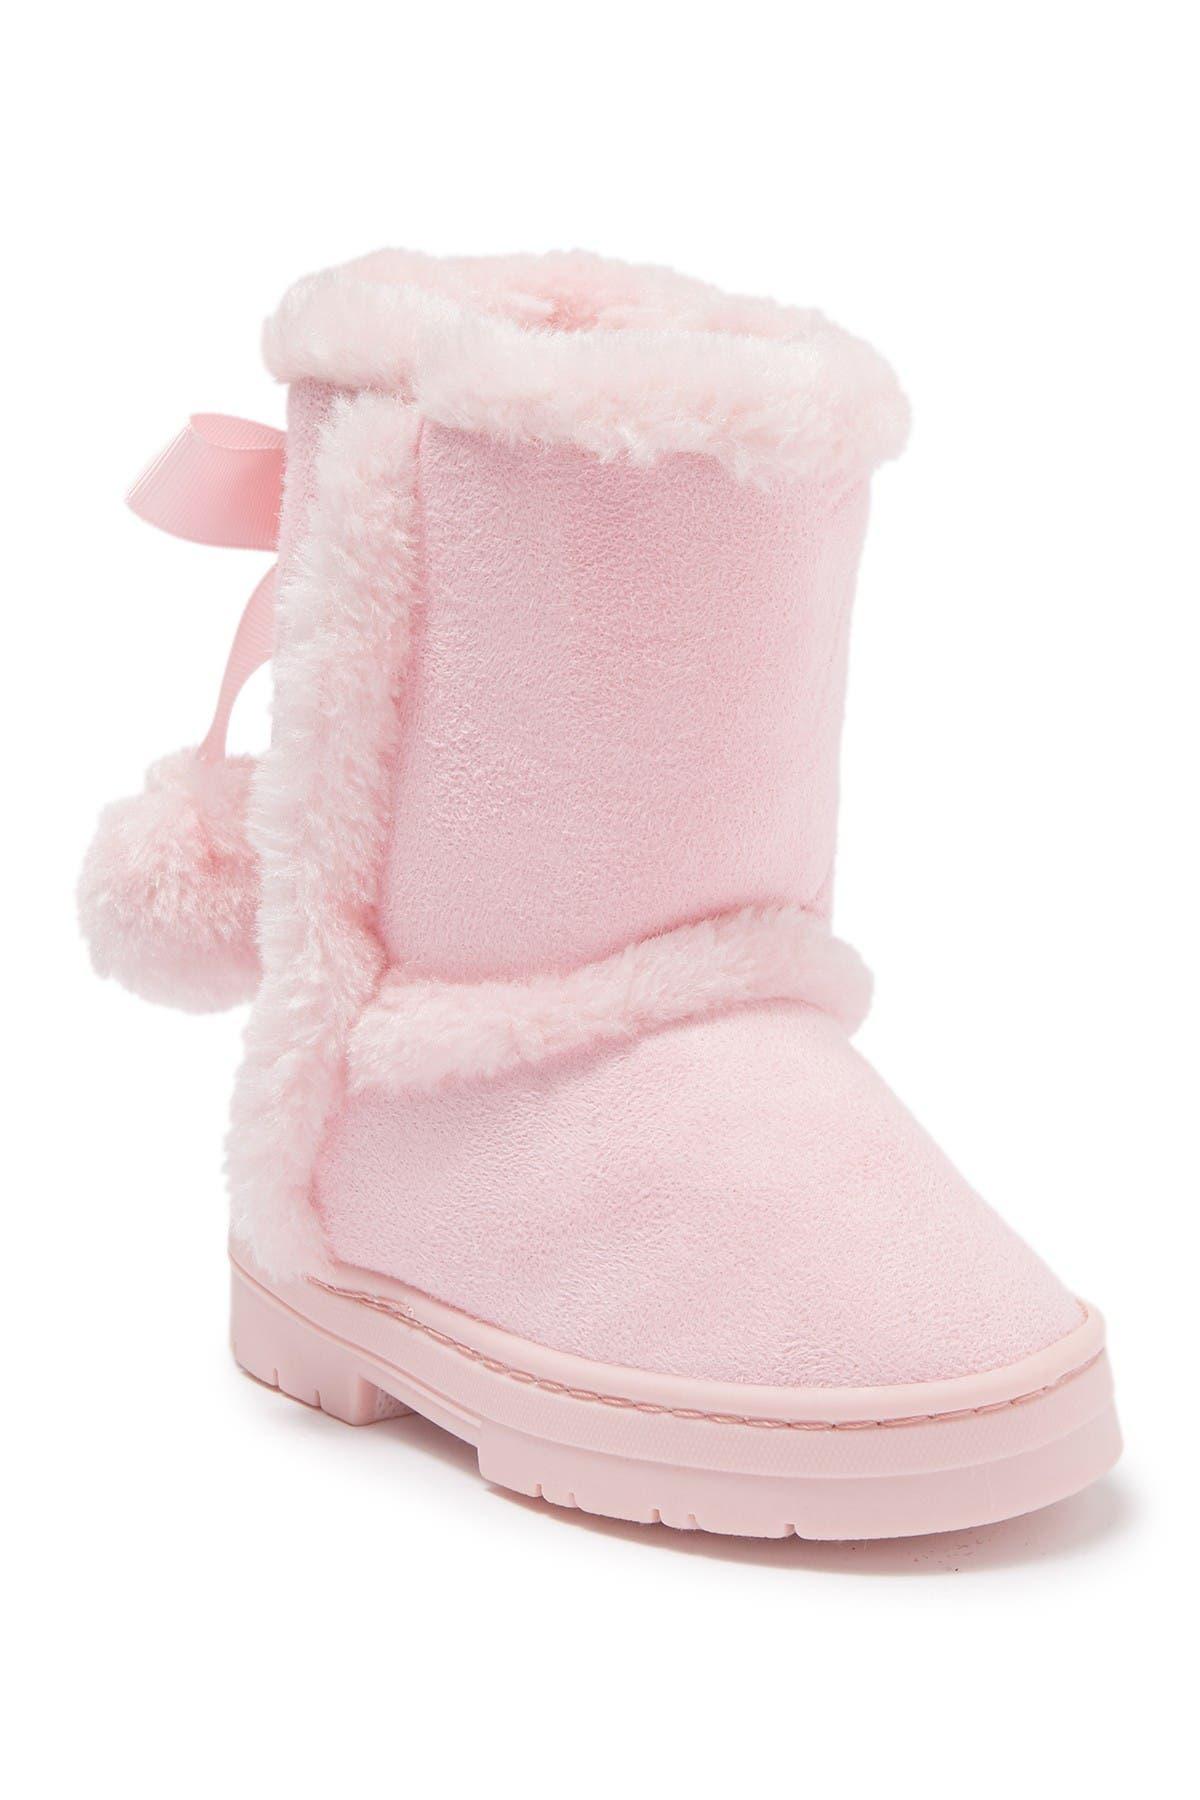 Image of bebe Microsuede Faux Fur Trimmed Winter Boot